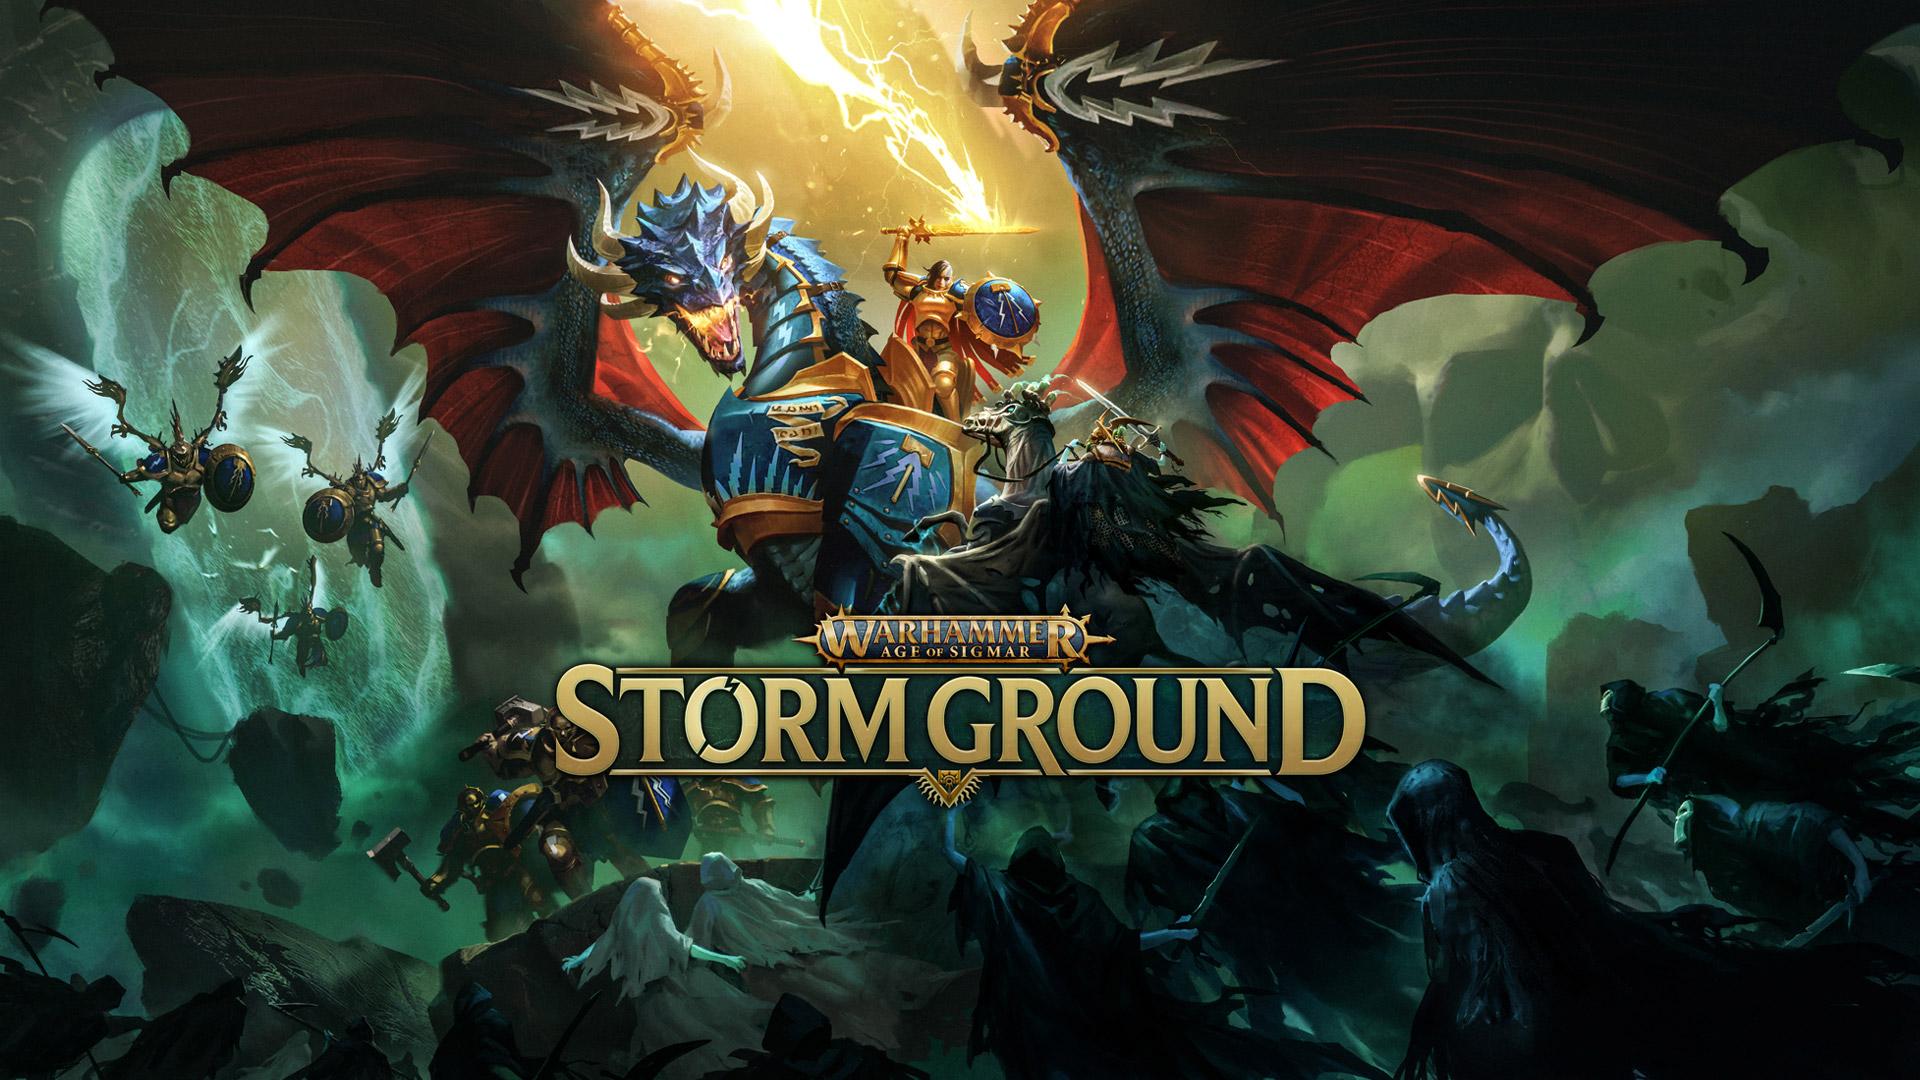 Free Warhammer Age of Sigmar: Storm Ground Wallpaper in 1920x1080